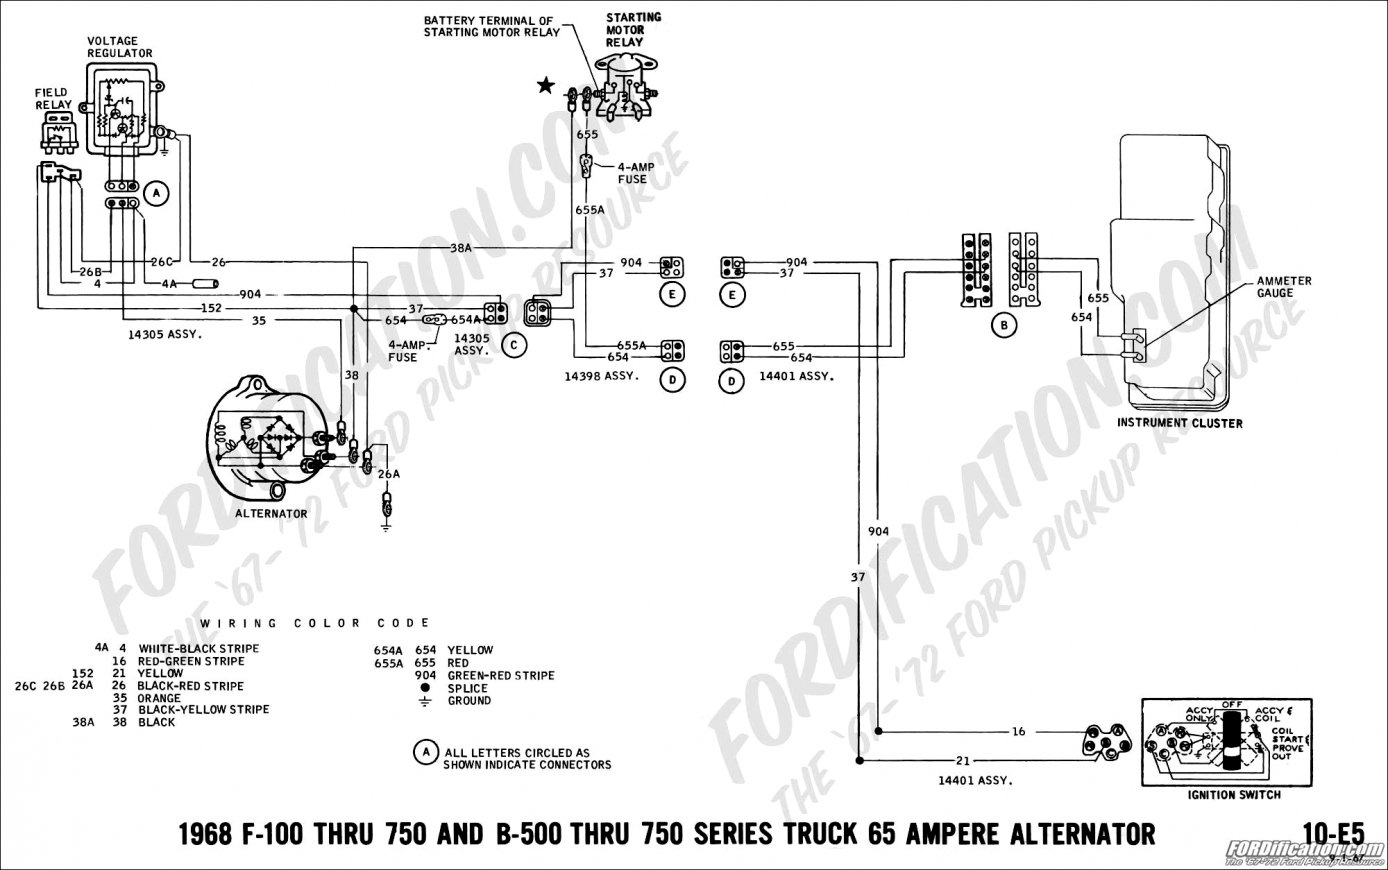 Gm Internally Regulated Alternator Wiring Diagram   Manual E-Books - Gm Alternator Wiring Diagram Internal Regulator